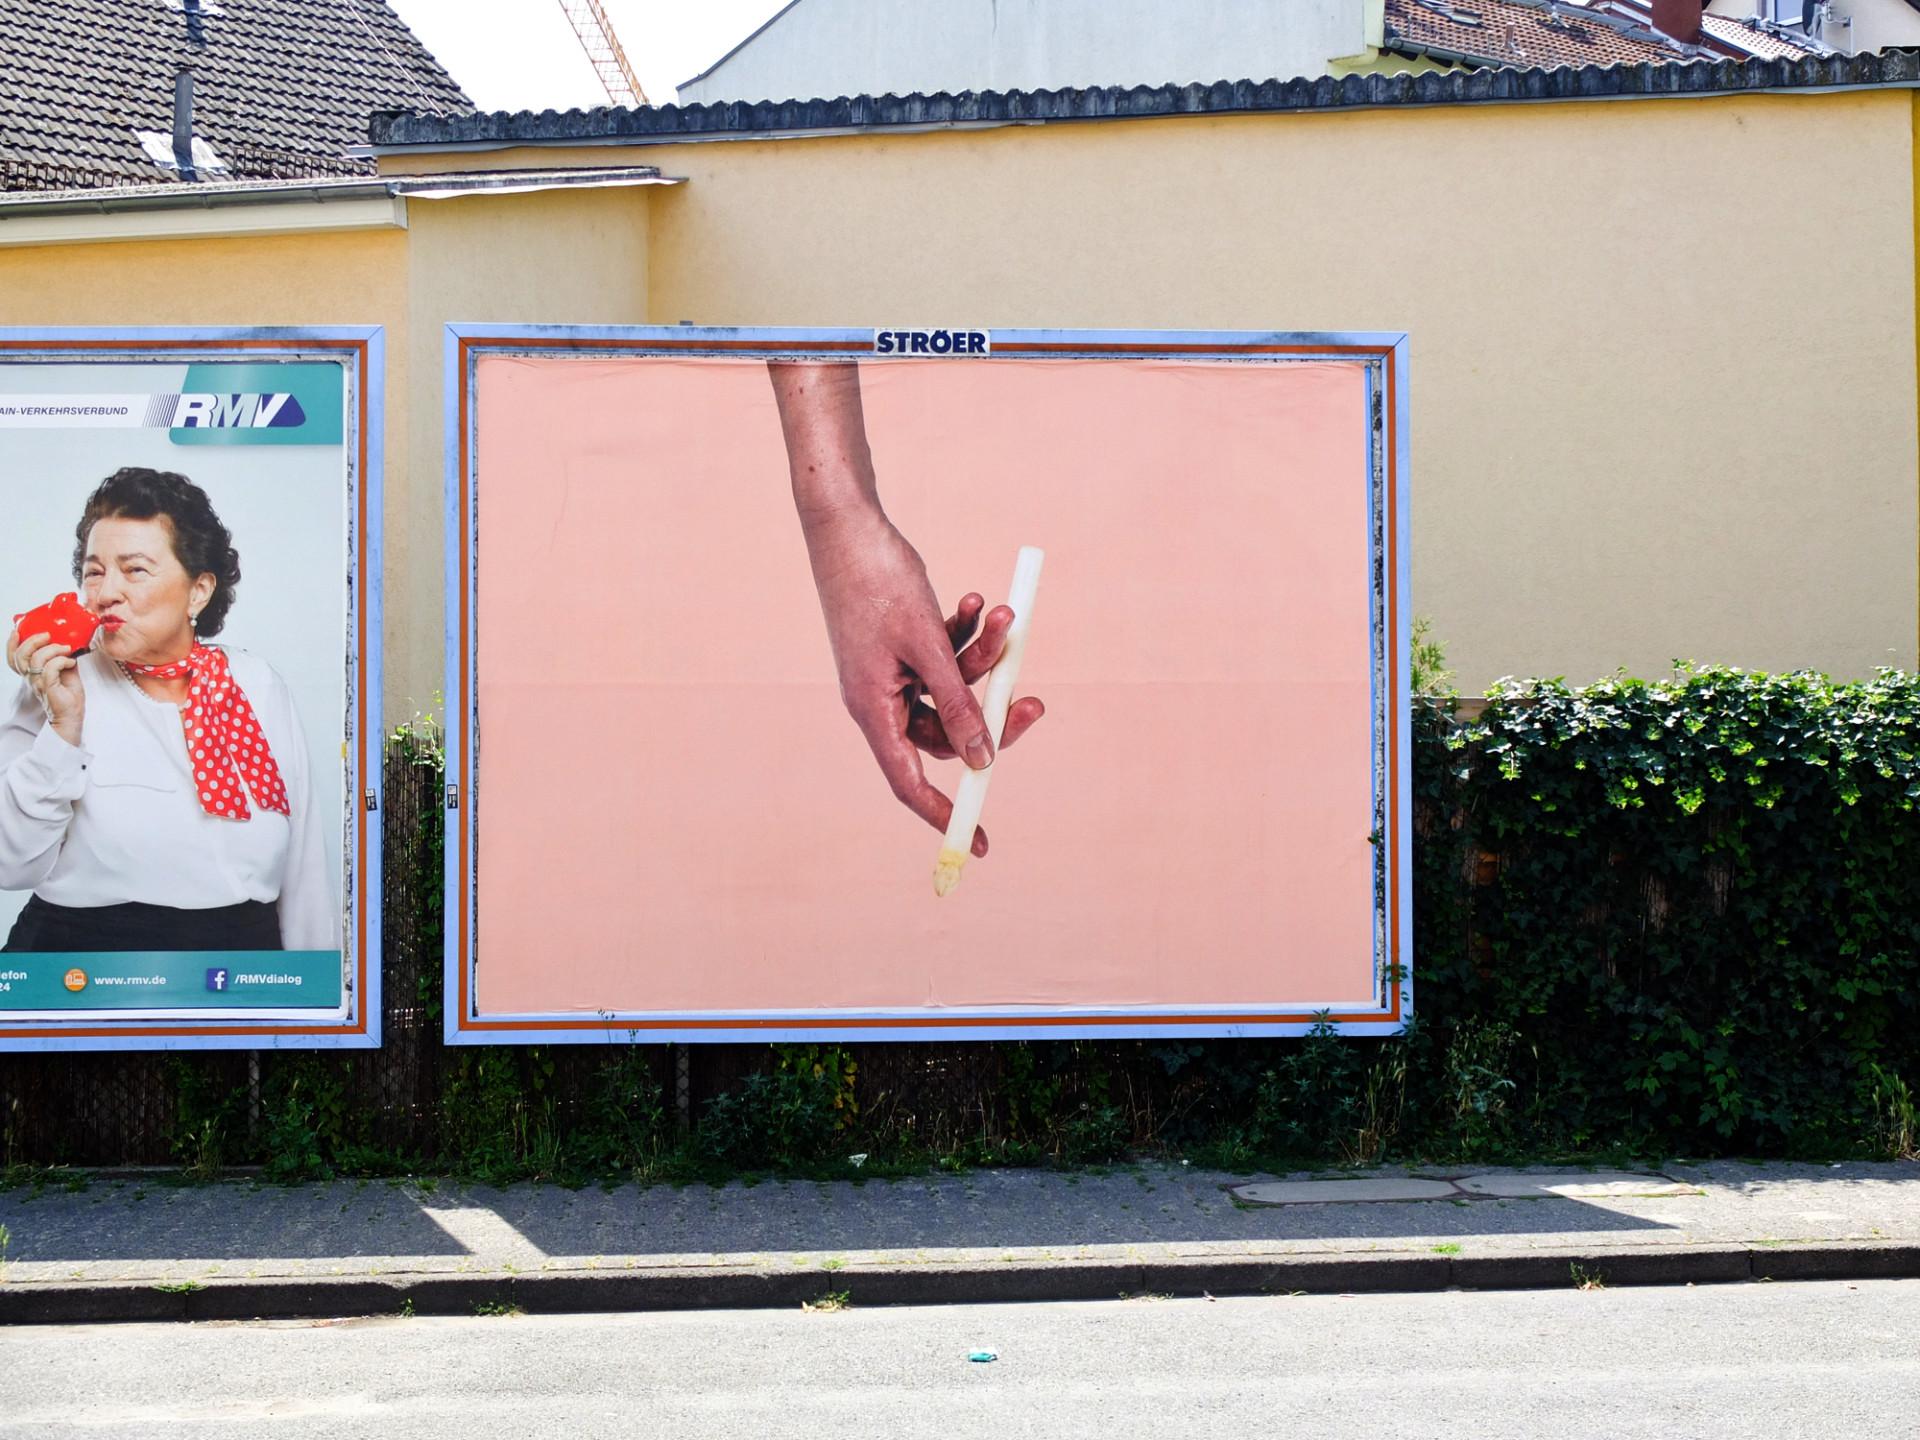 2 min ago - DUESSELDORF PHOTO PANELS OFFM PUBLIC ART PANELS